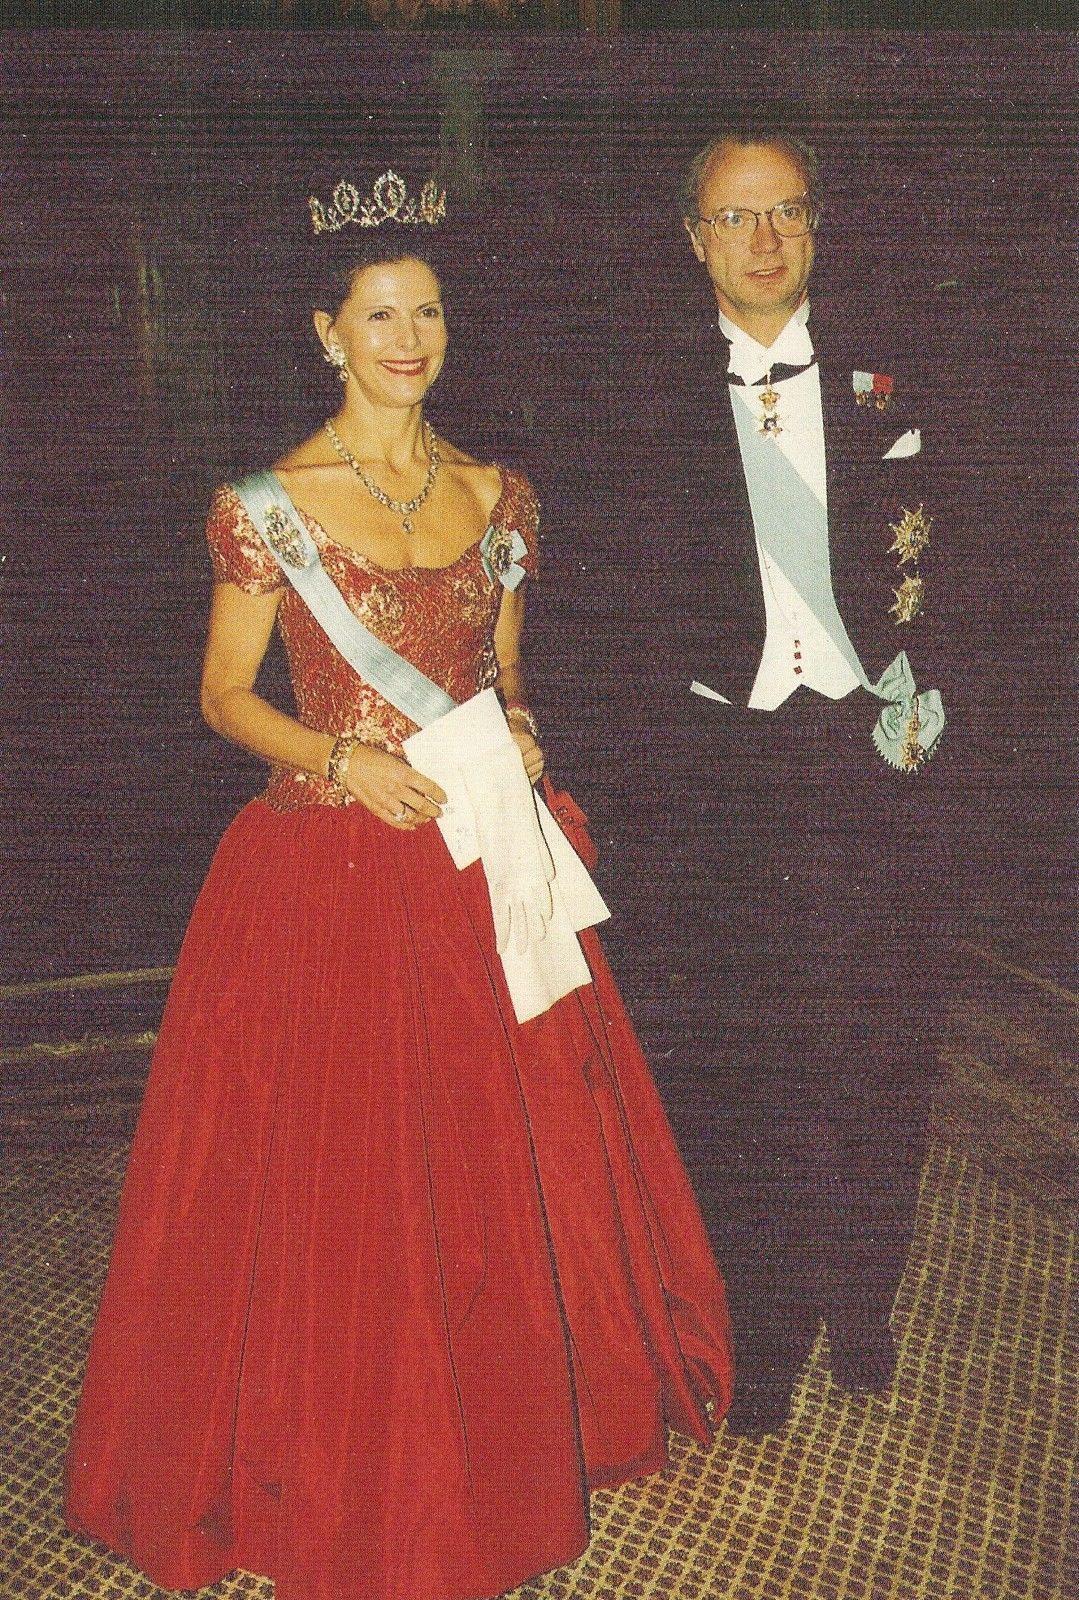 Königin Silvia-König Carl Gustaf-Adel-Royal-Original